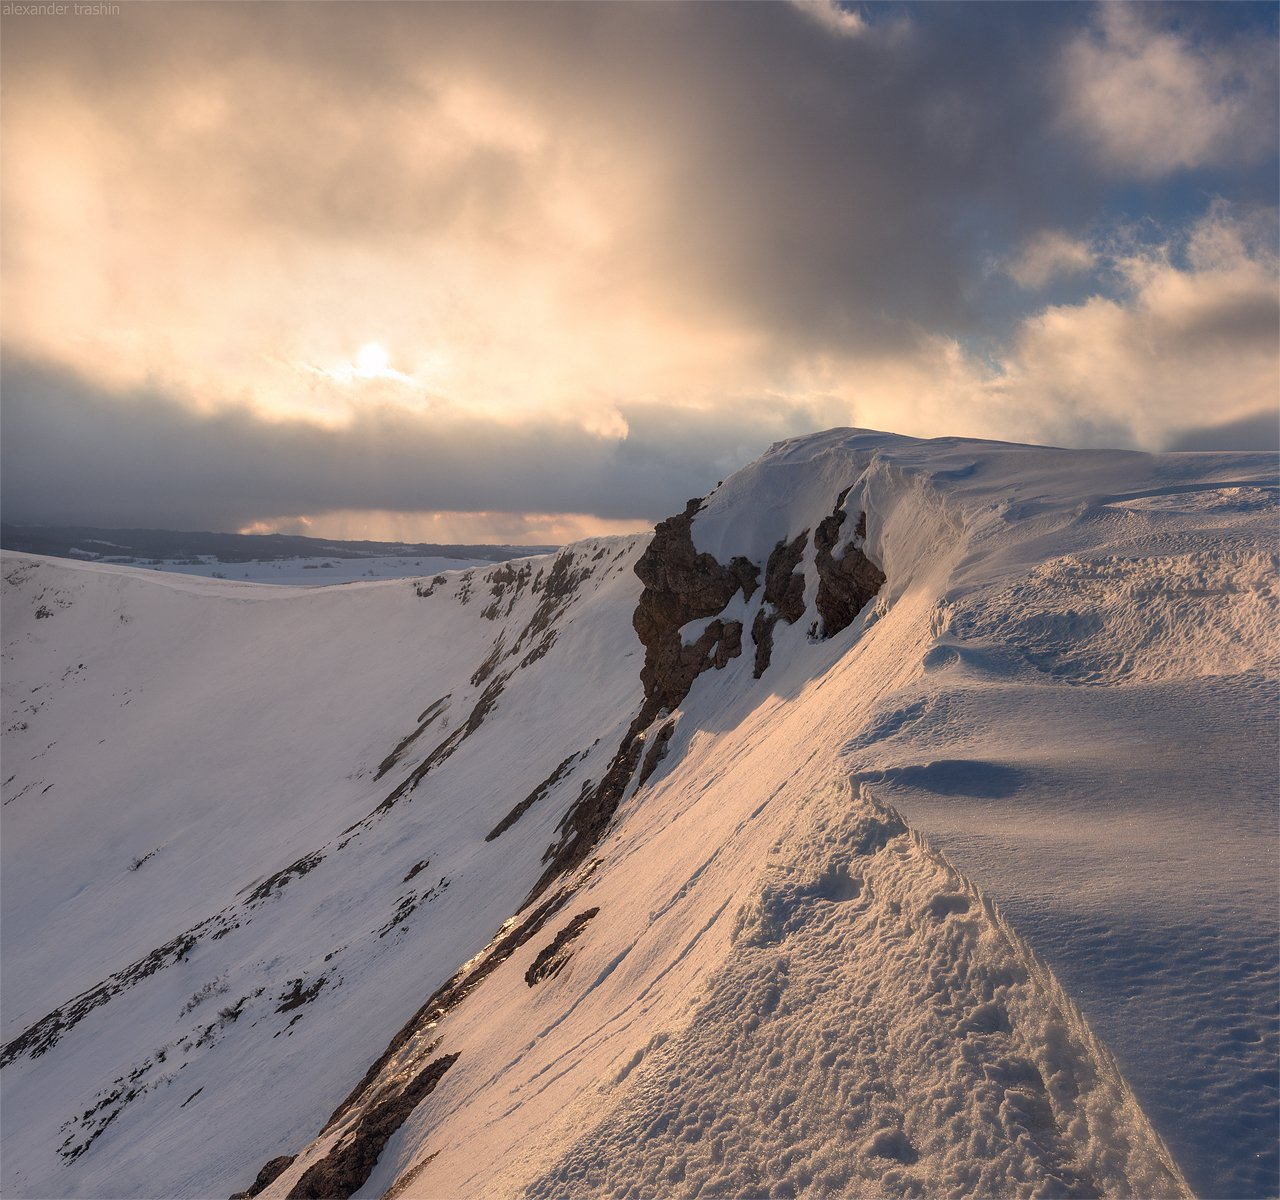 крым, чатыр-даг, зима, пейзаж, горный пейзаж, Александр Трашин